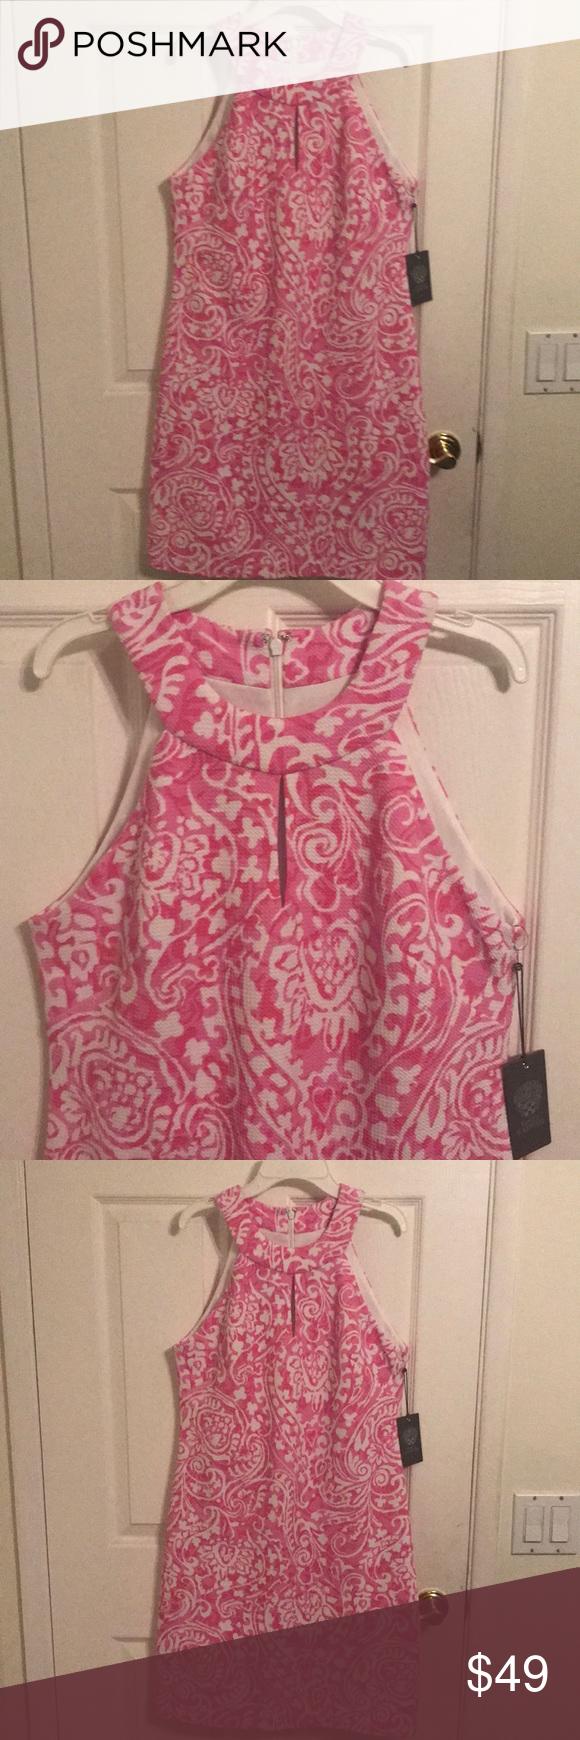 Sold Nwt Vince Camuto Halter Shift Dress 10 138 Shift Dress Dresses Vince Camuto [ 1740 x 580 Pixel ]